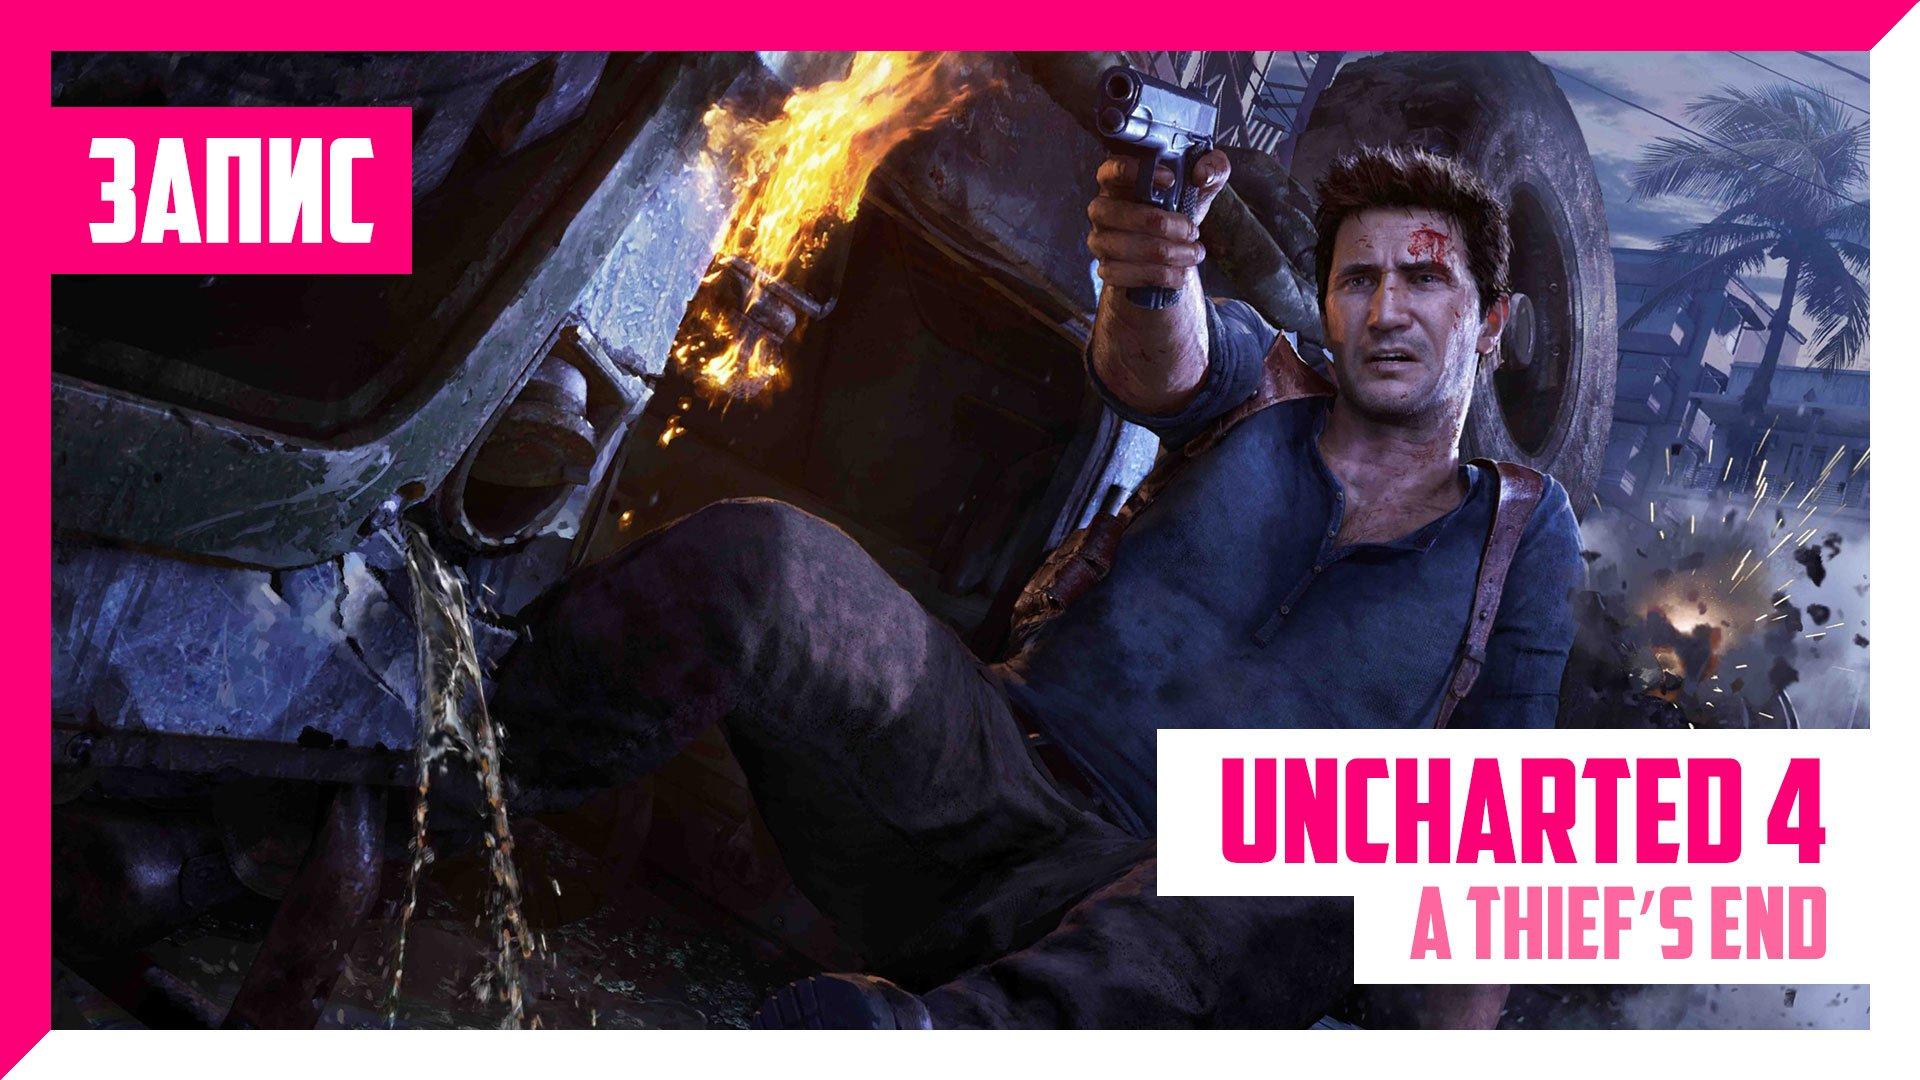 Стрім Uncharted 4: A Thief's End by @Erleke   ЗАПИС (Ретроспектива Uncharted)